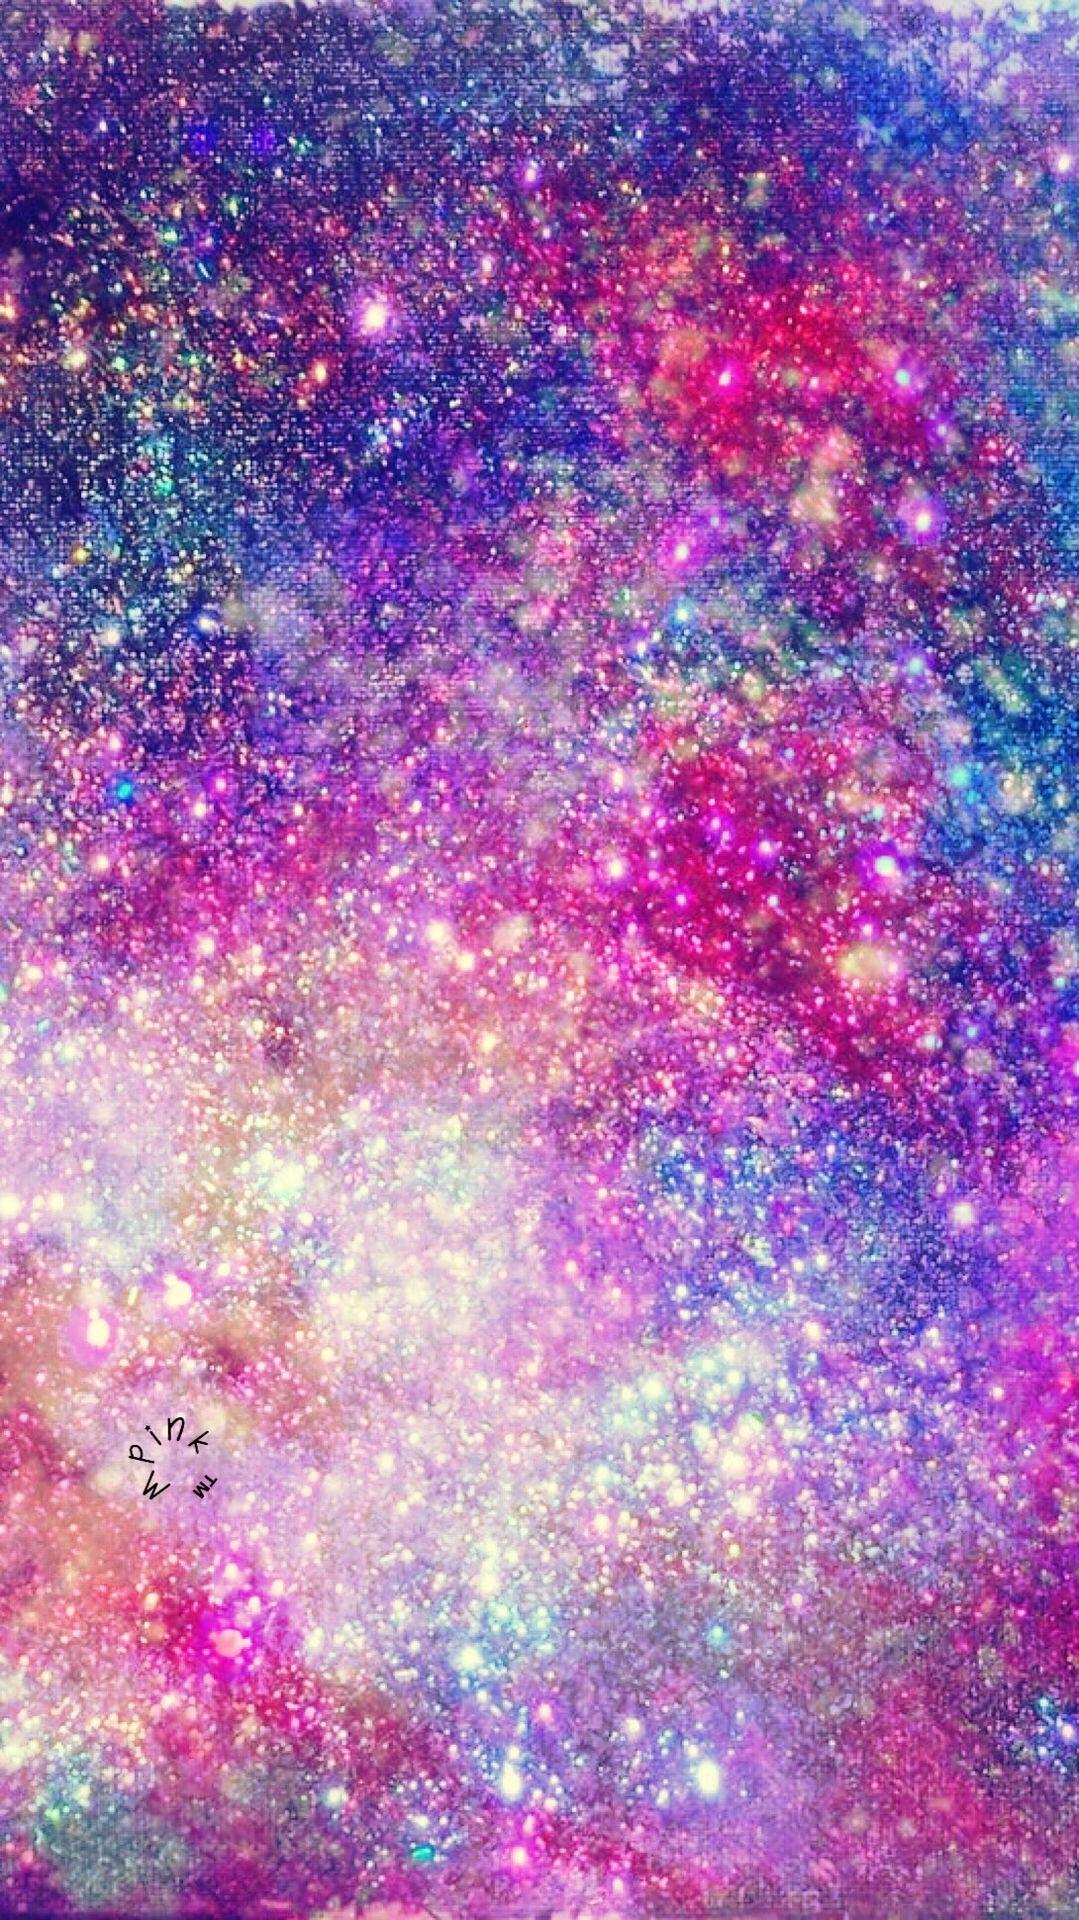 galaxy splash wallpaper | my wallpaper creations | pinterest